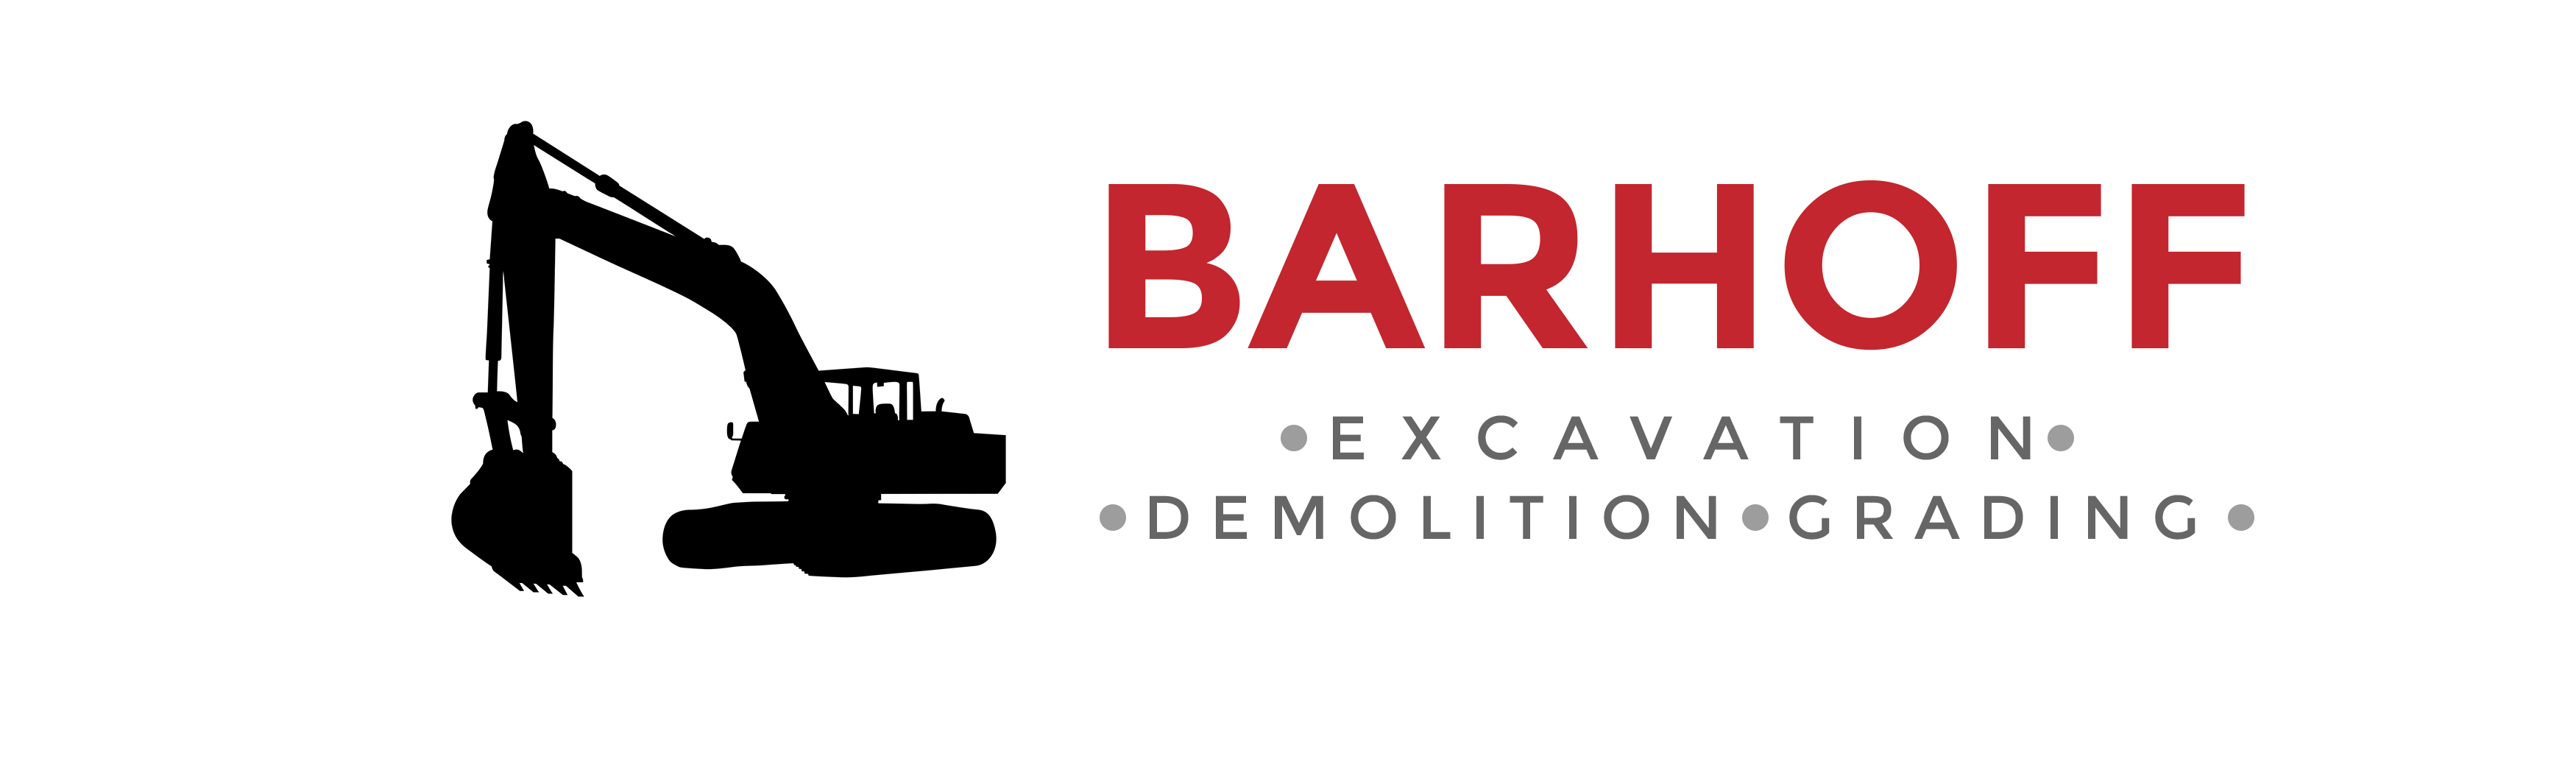 Barhoff Excavation